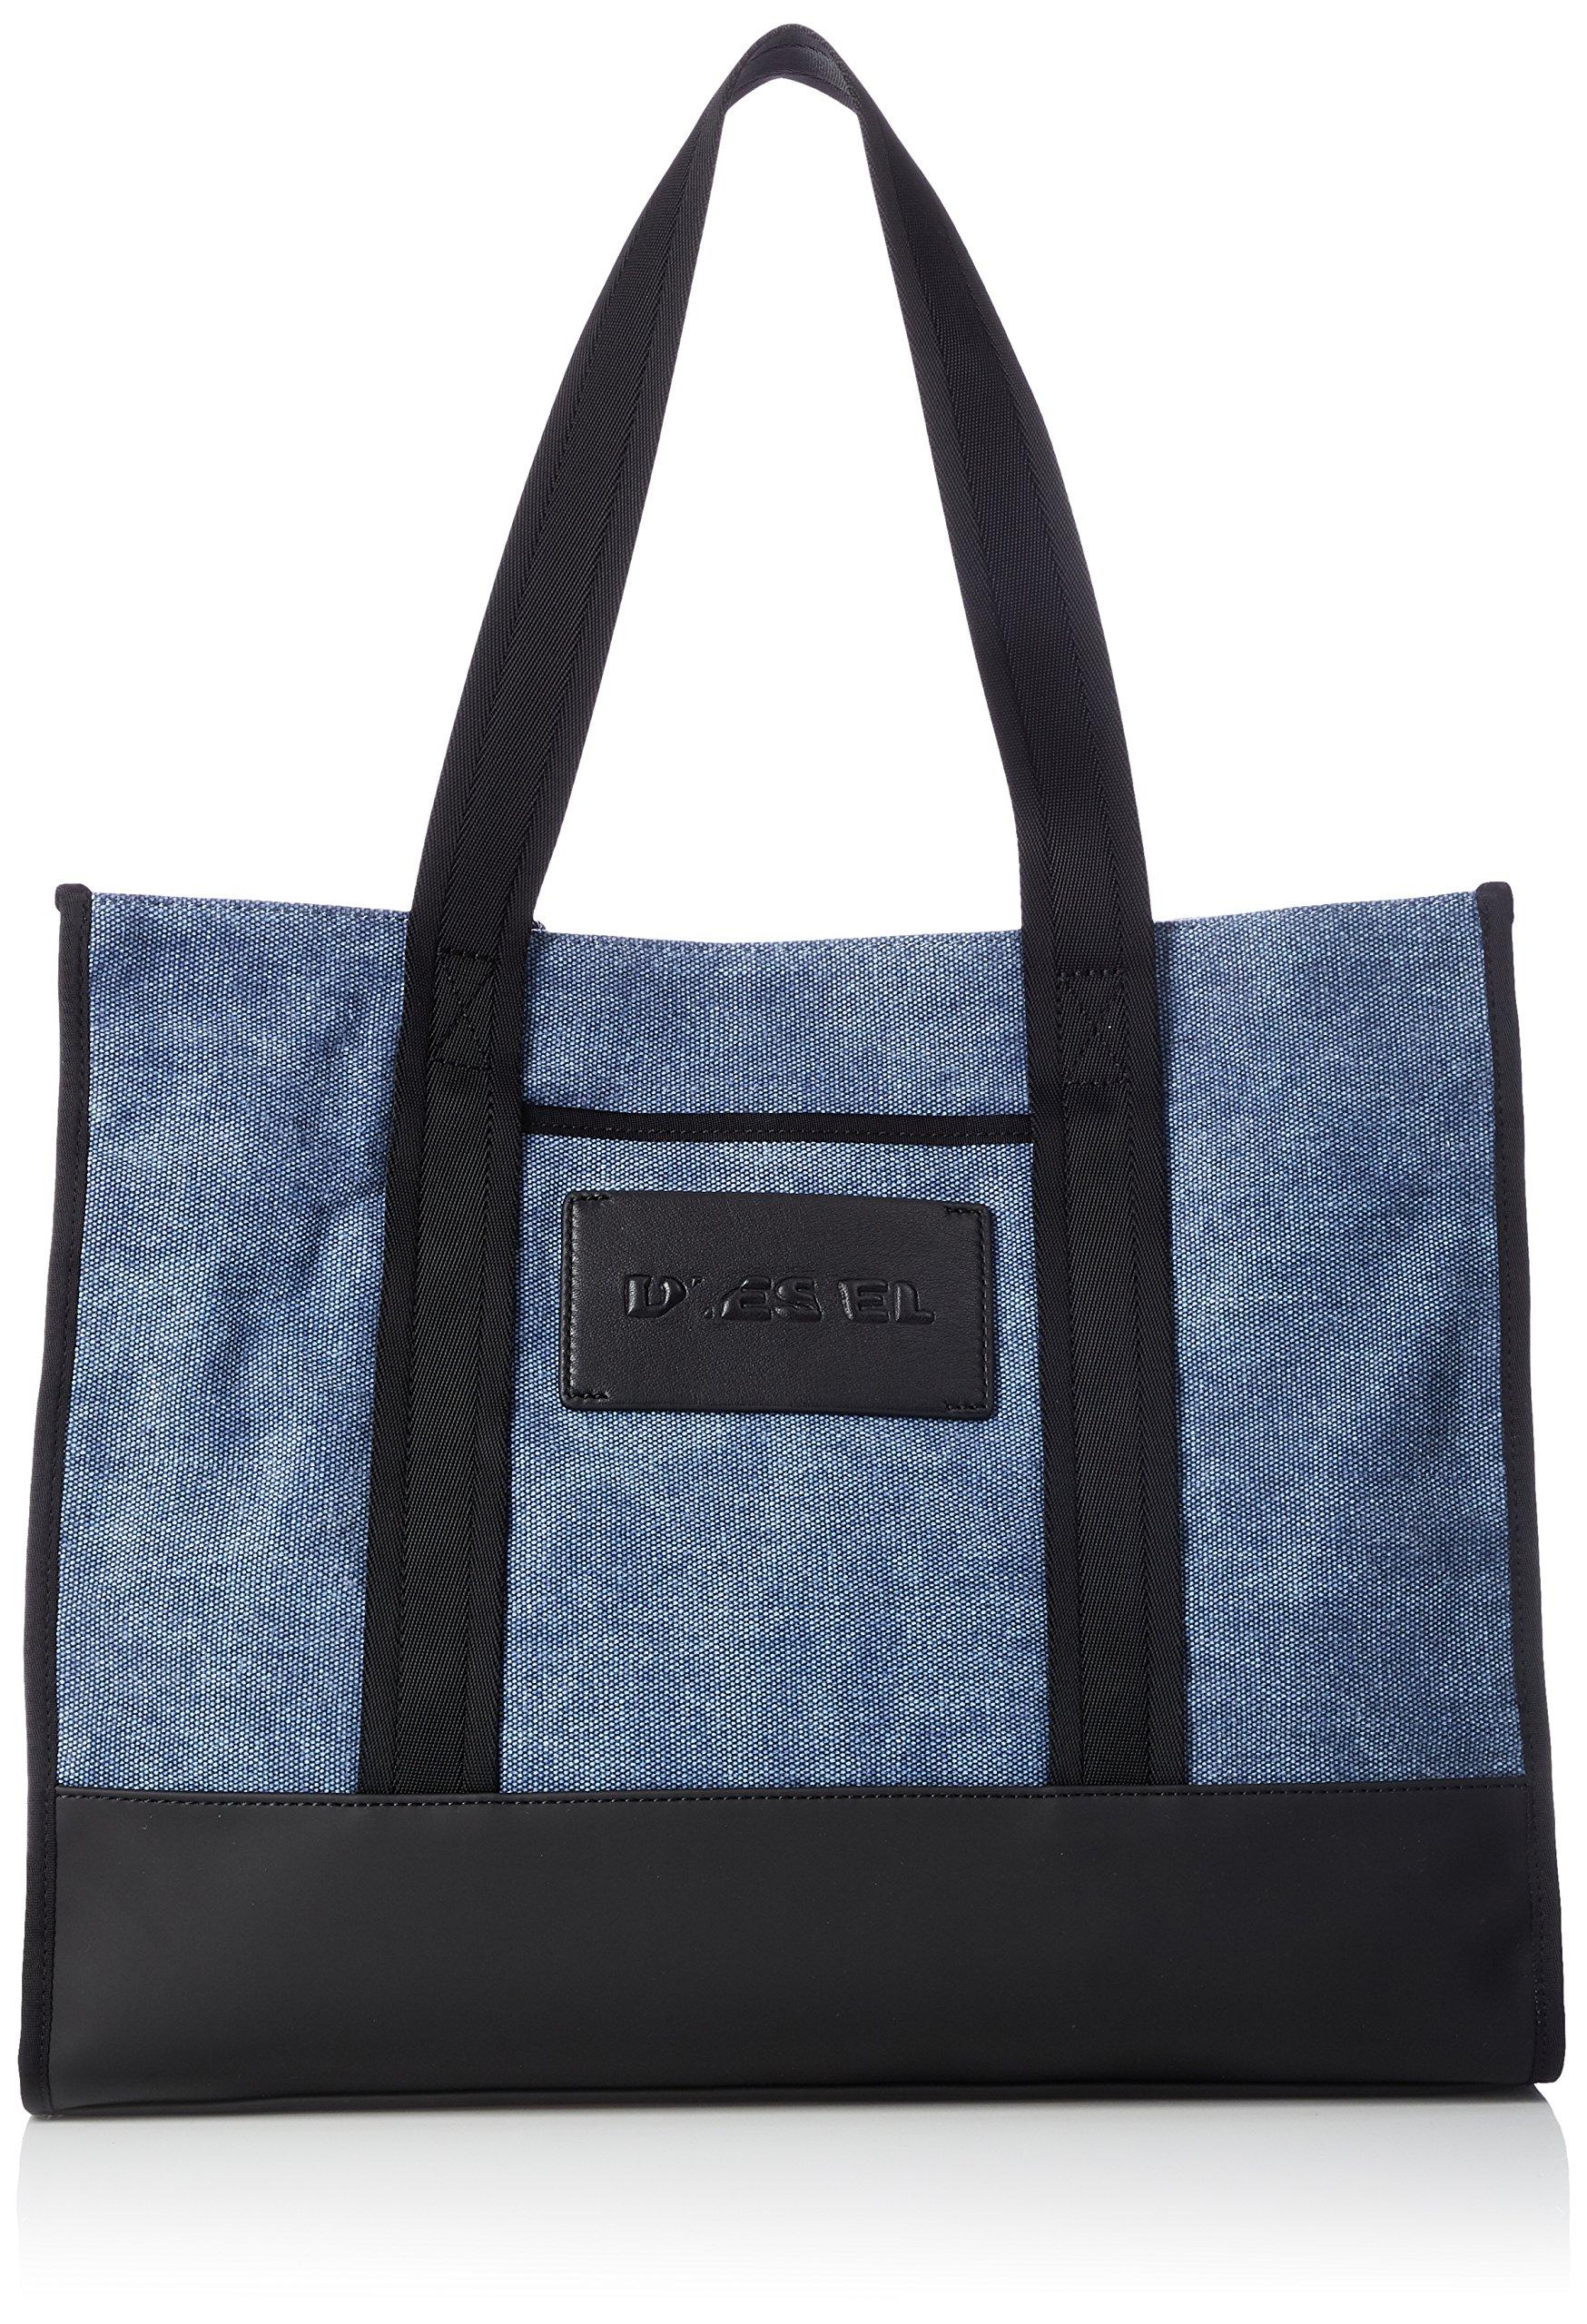 Diesel Men's M-CAGE Shopper-Shopping Bag, peacoat blue/black, One Size